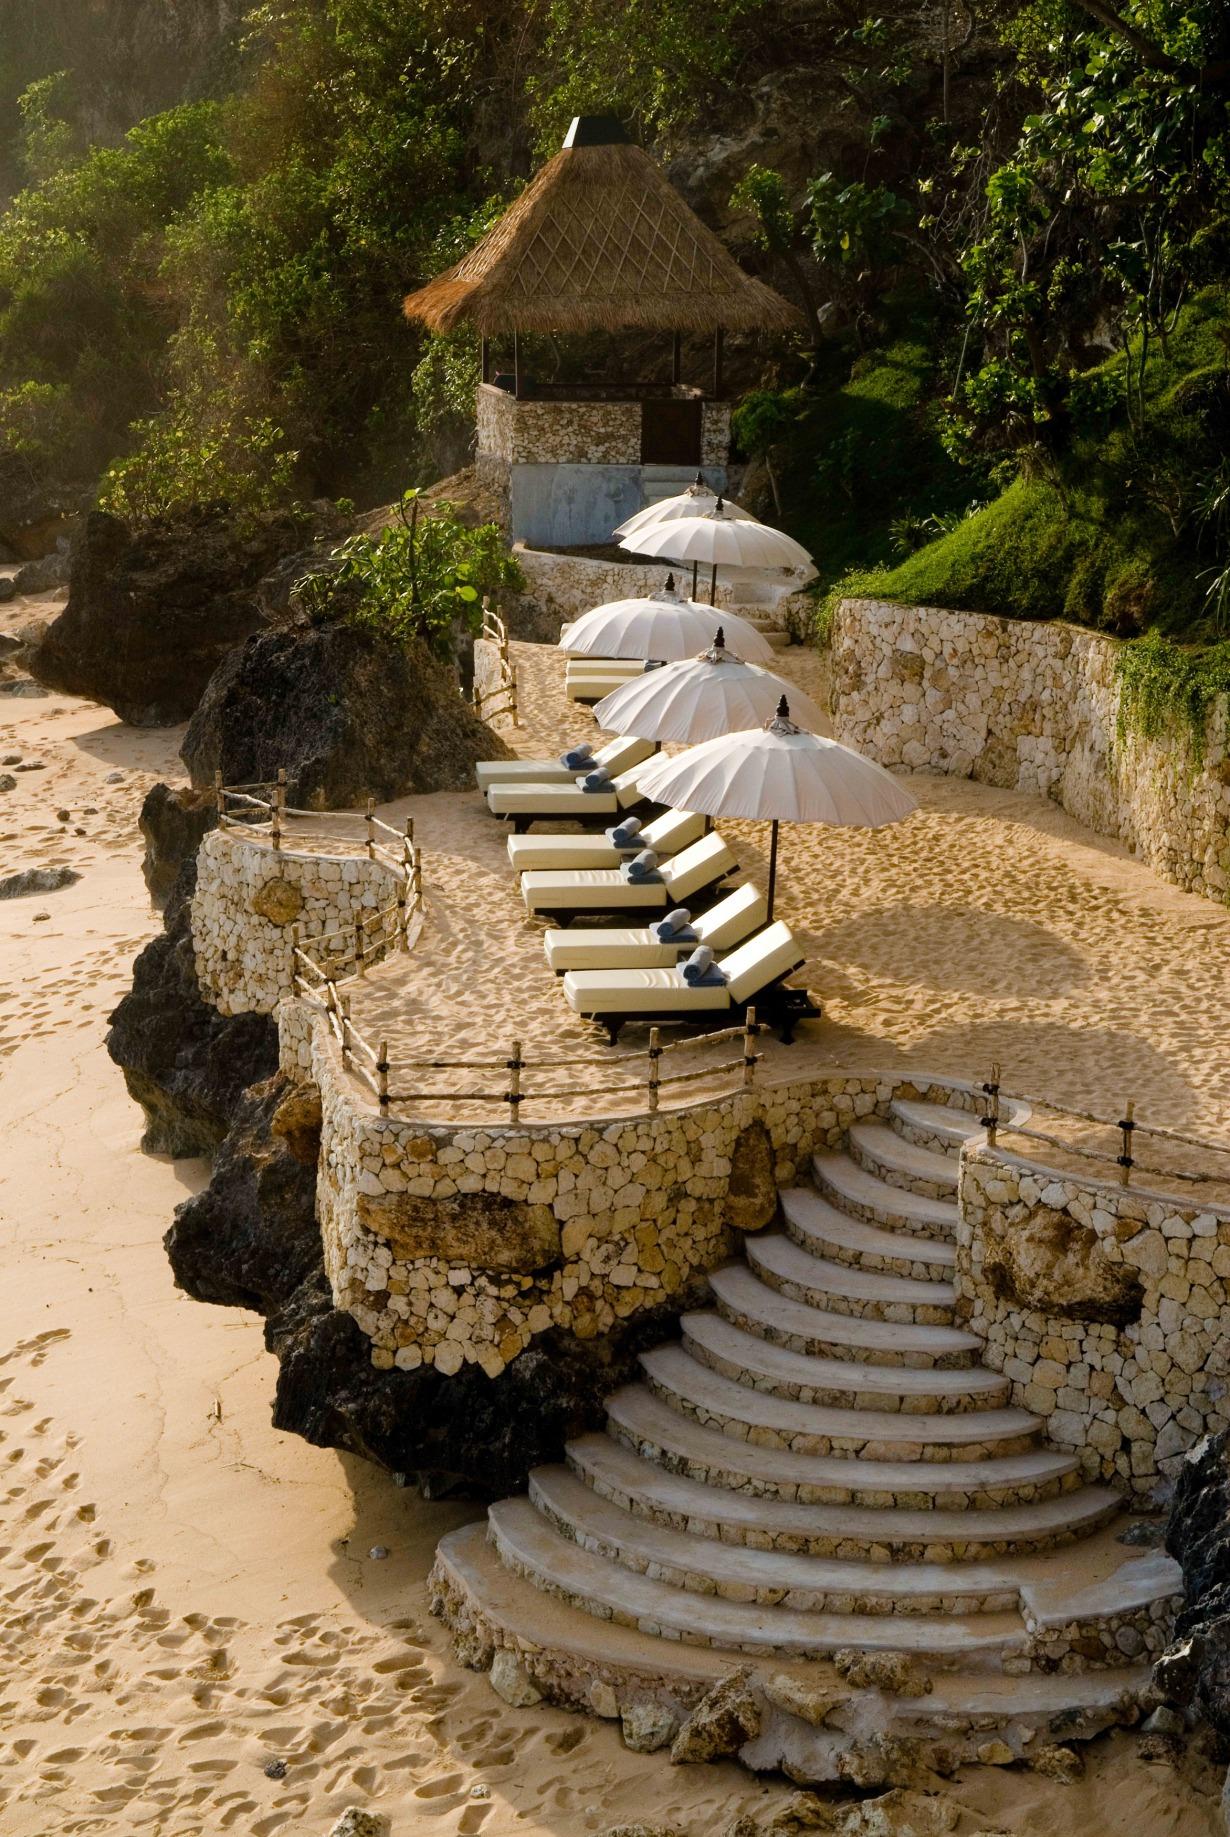 Bulgari Bali - Bali luxury hotel